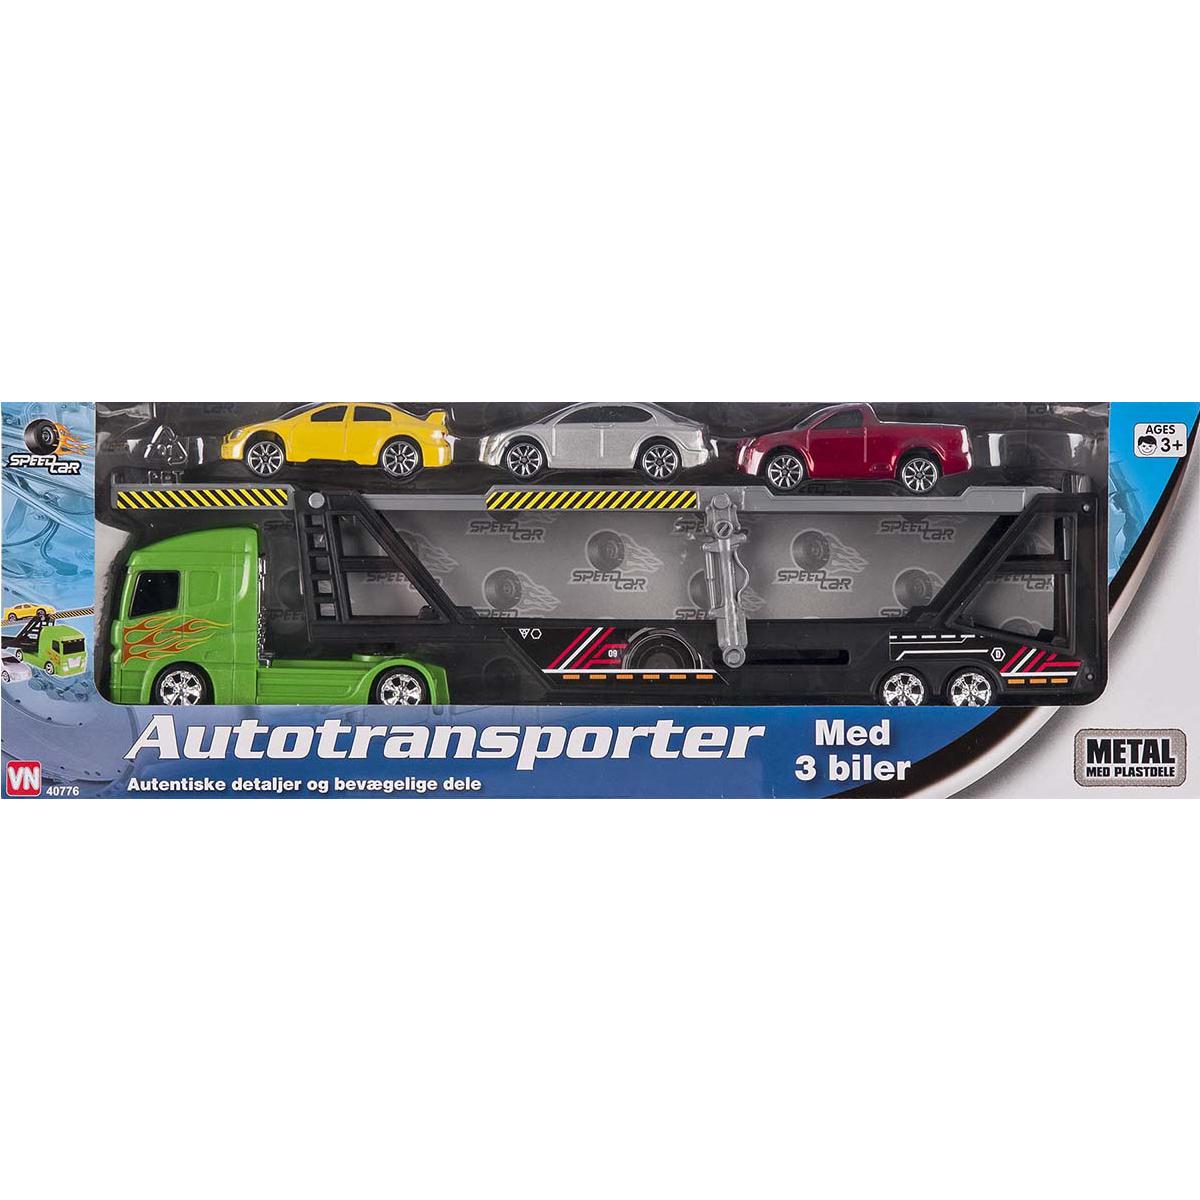 Speed autotransporter